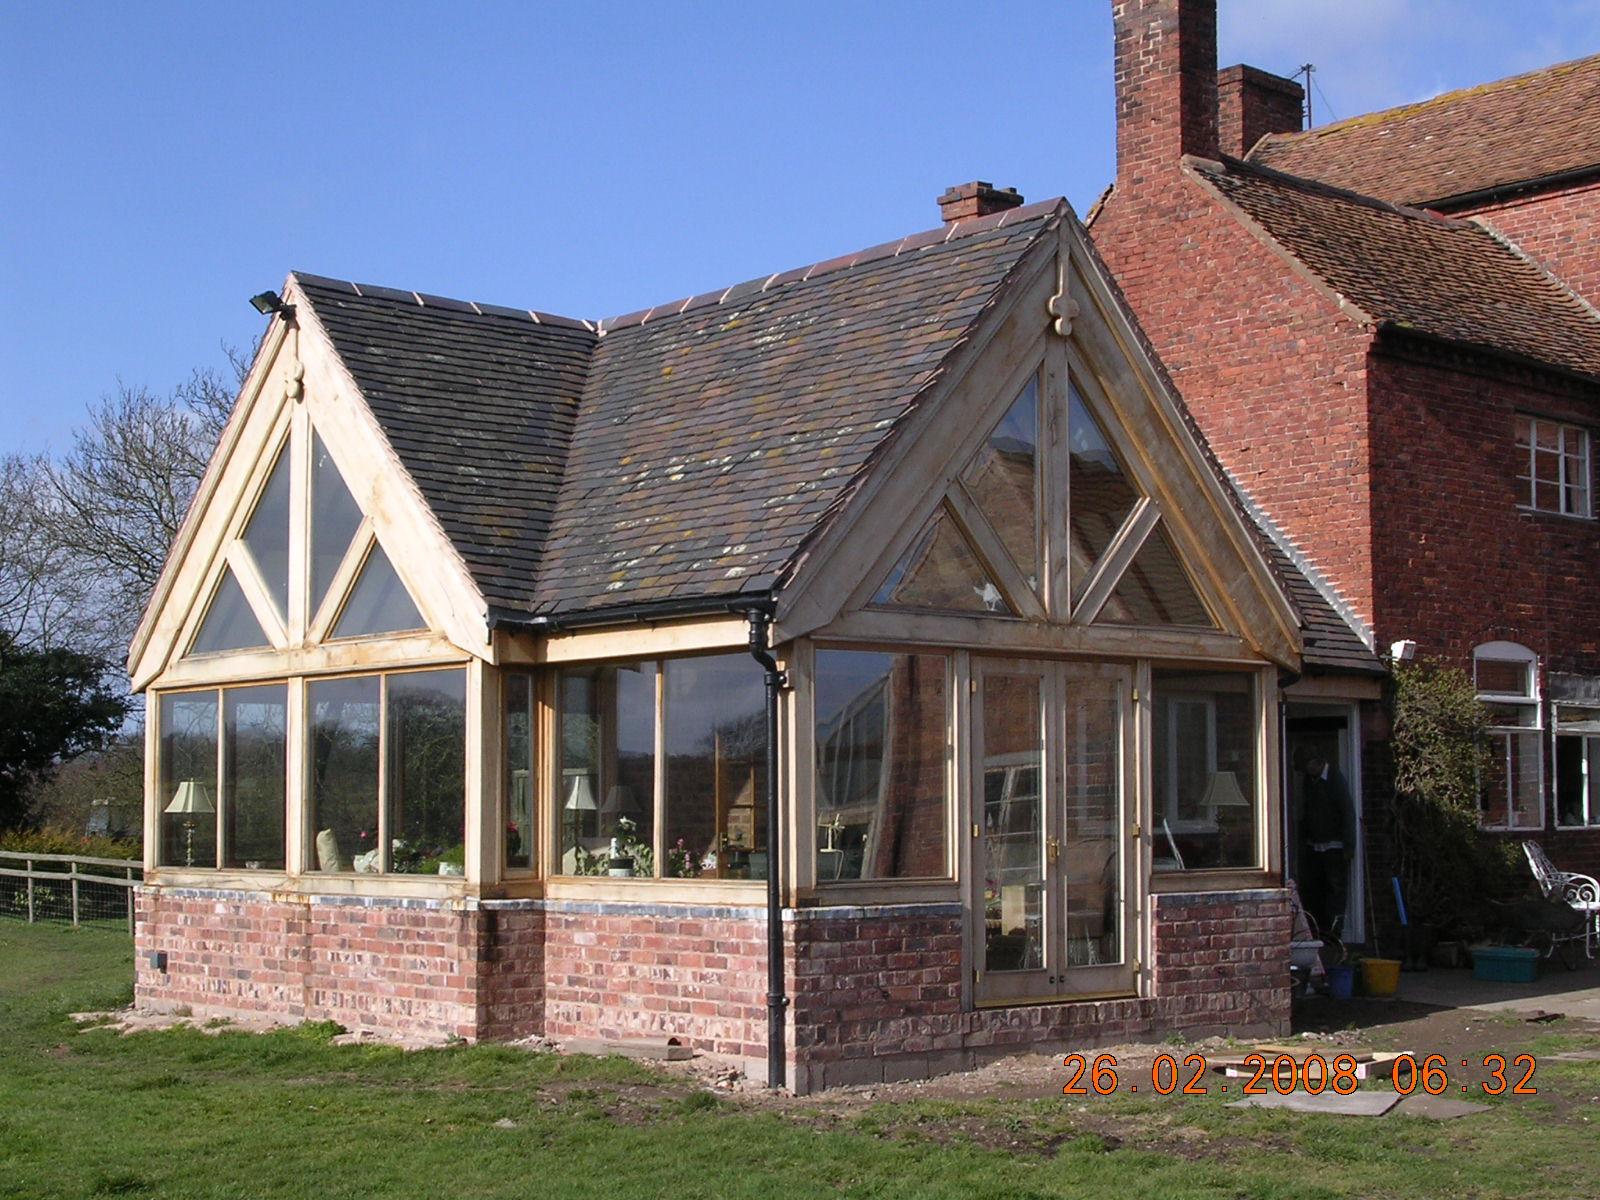 Broughton Farm - Bobbington - Nearing completion